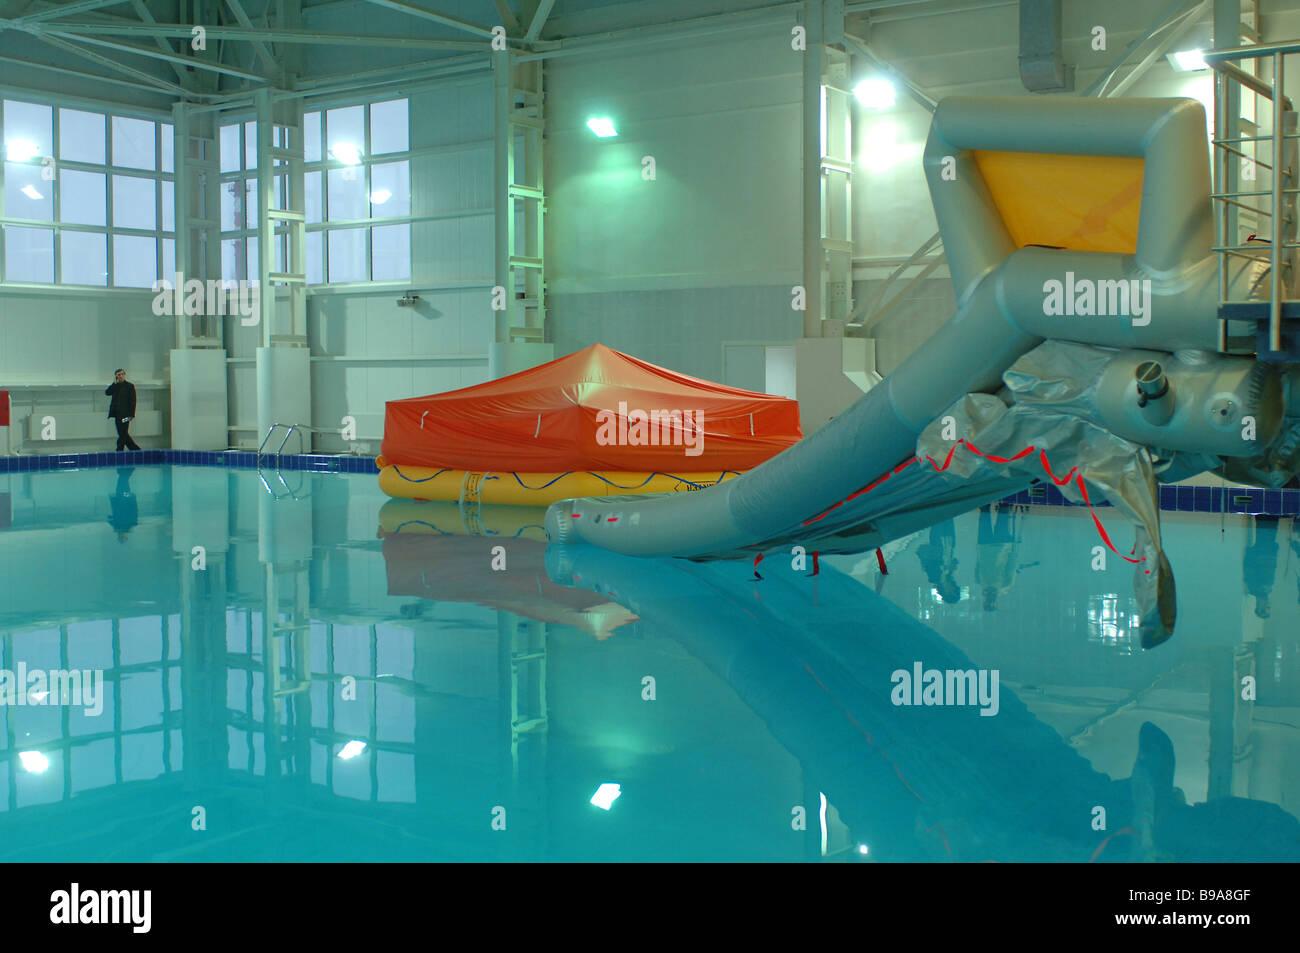 Water Land simulator facility for emergency training of flight crews - Stock Image